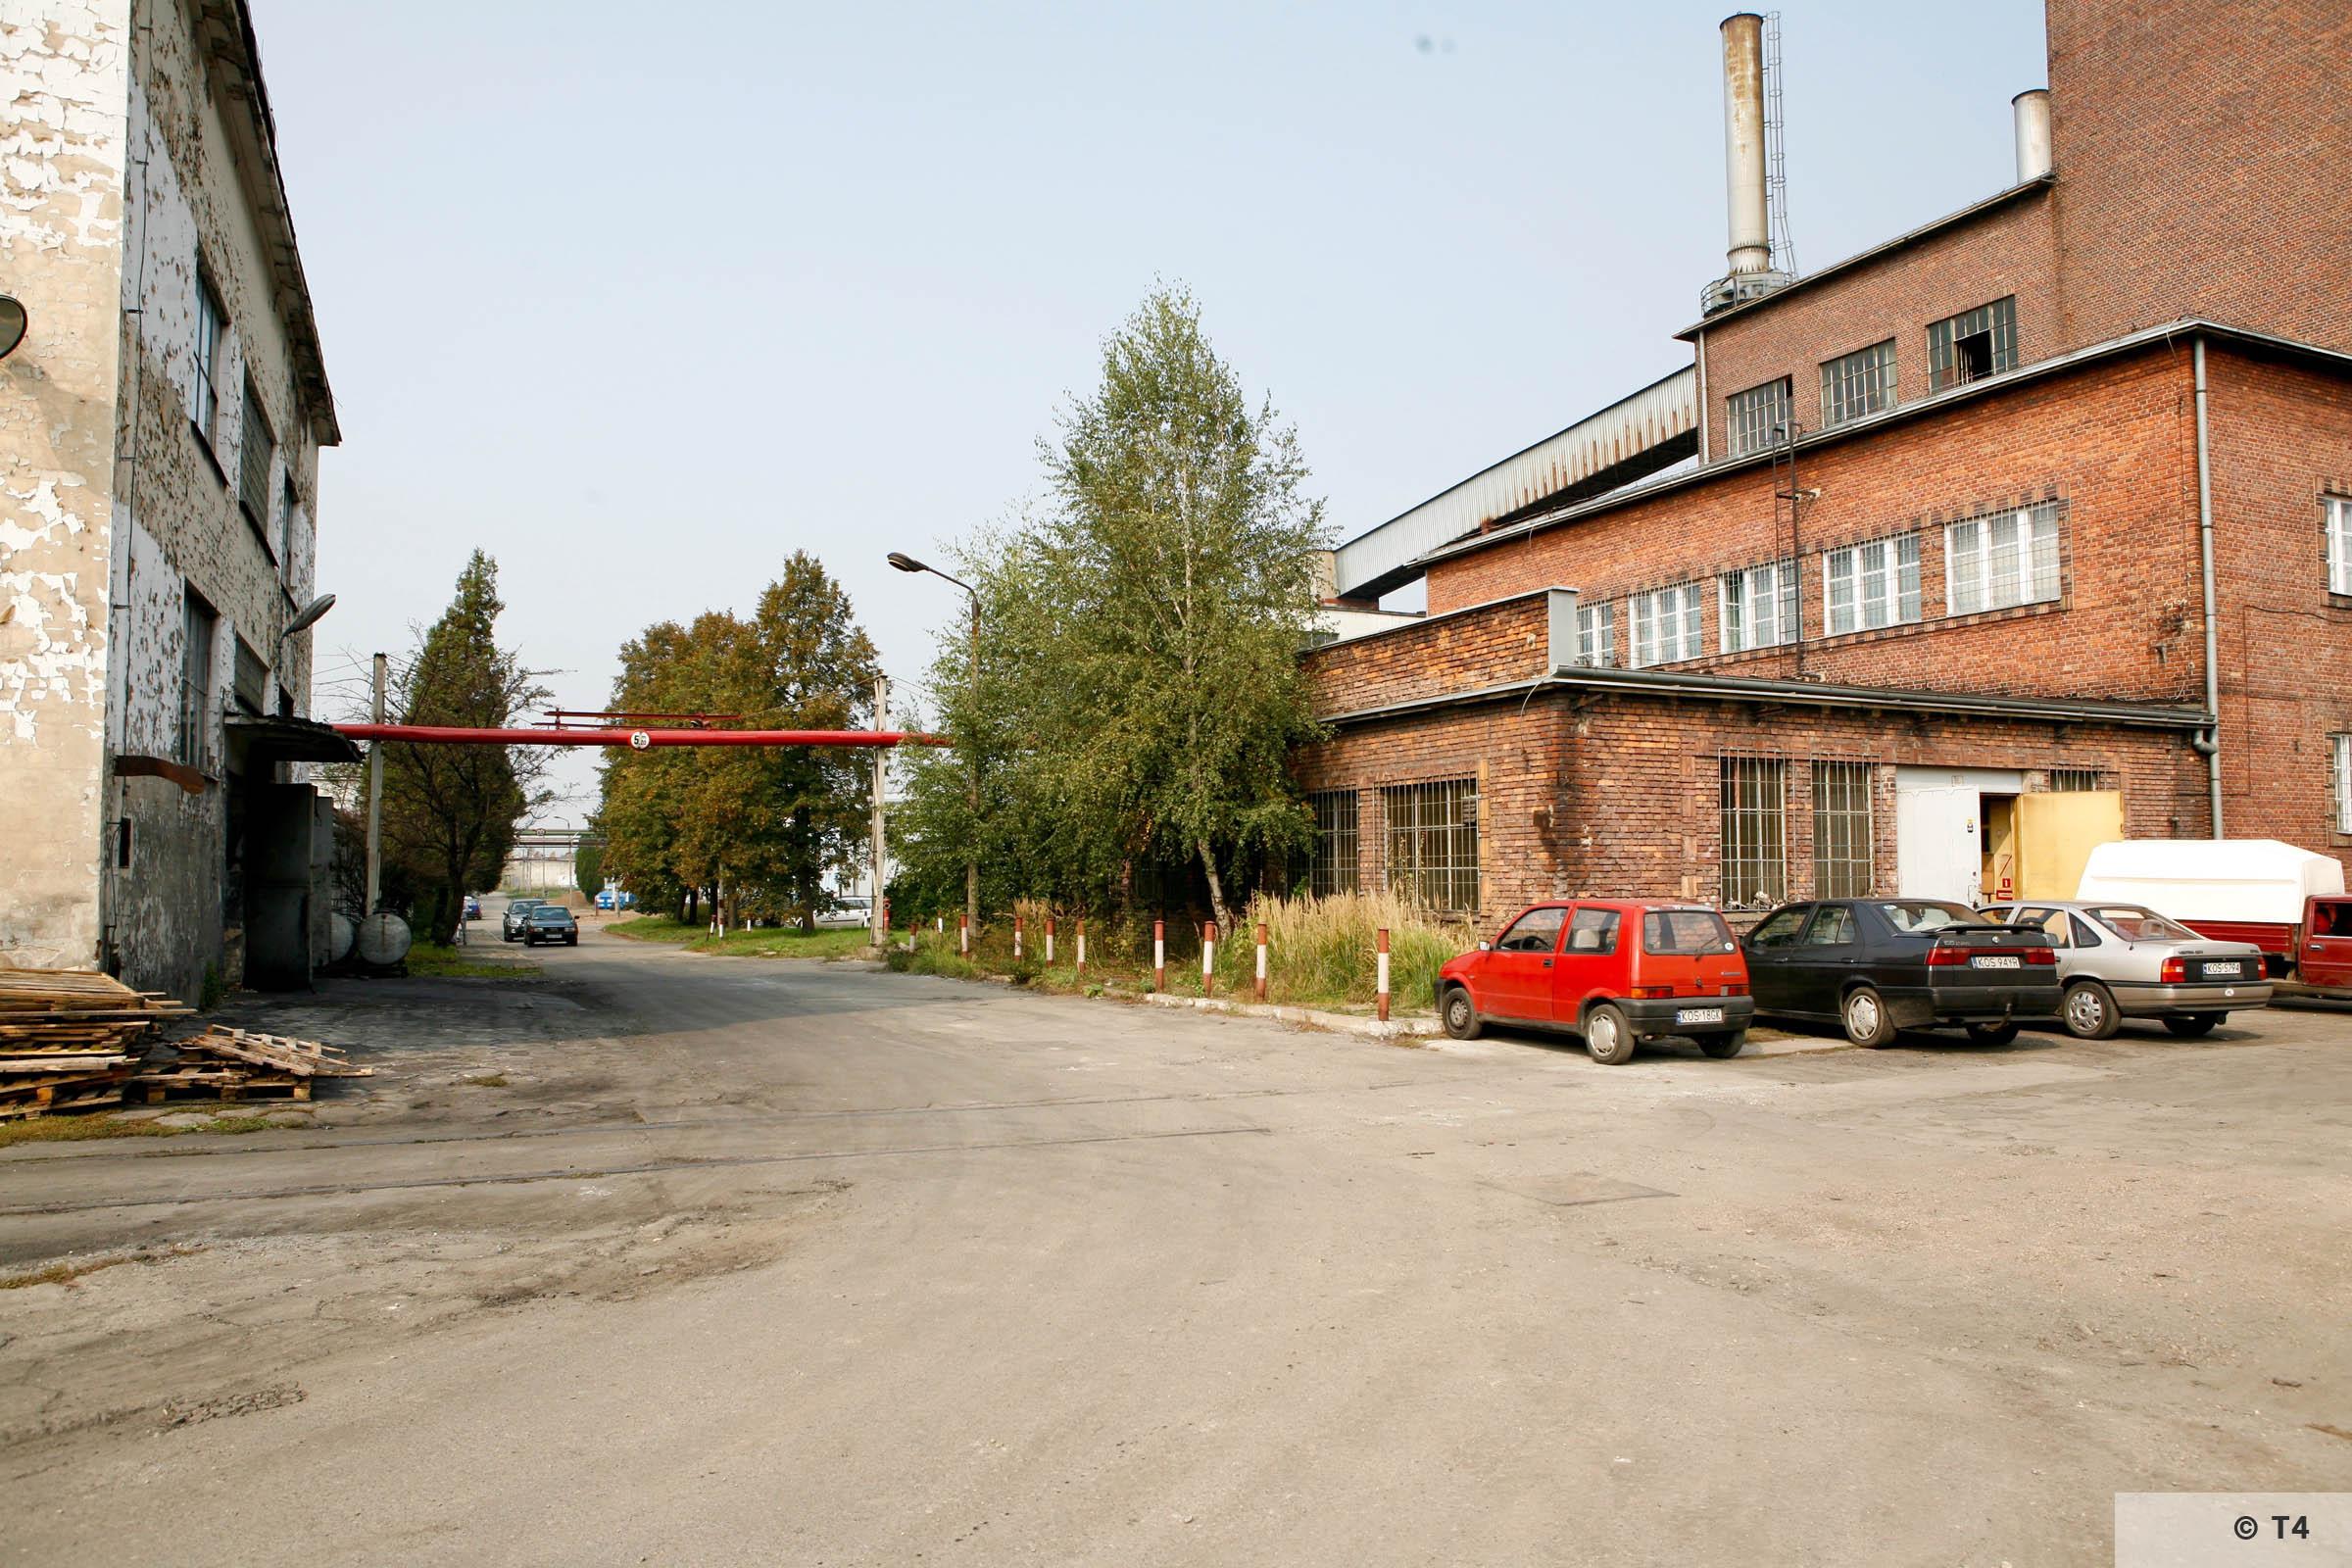 Bata factory. 2006 T4 1635